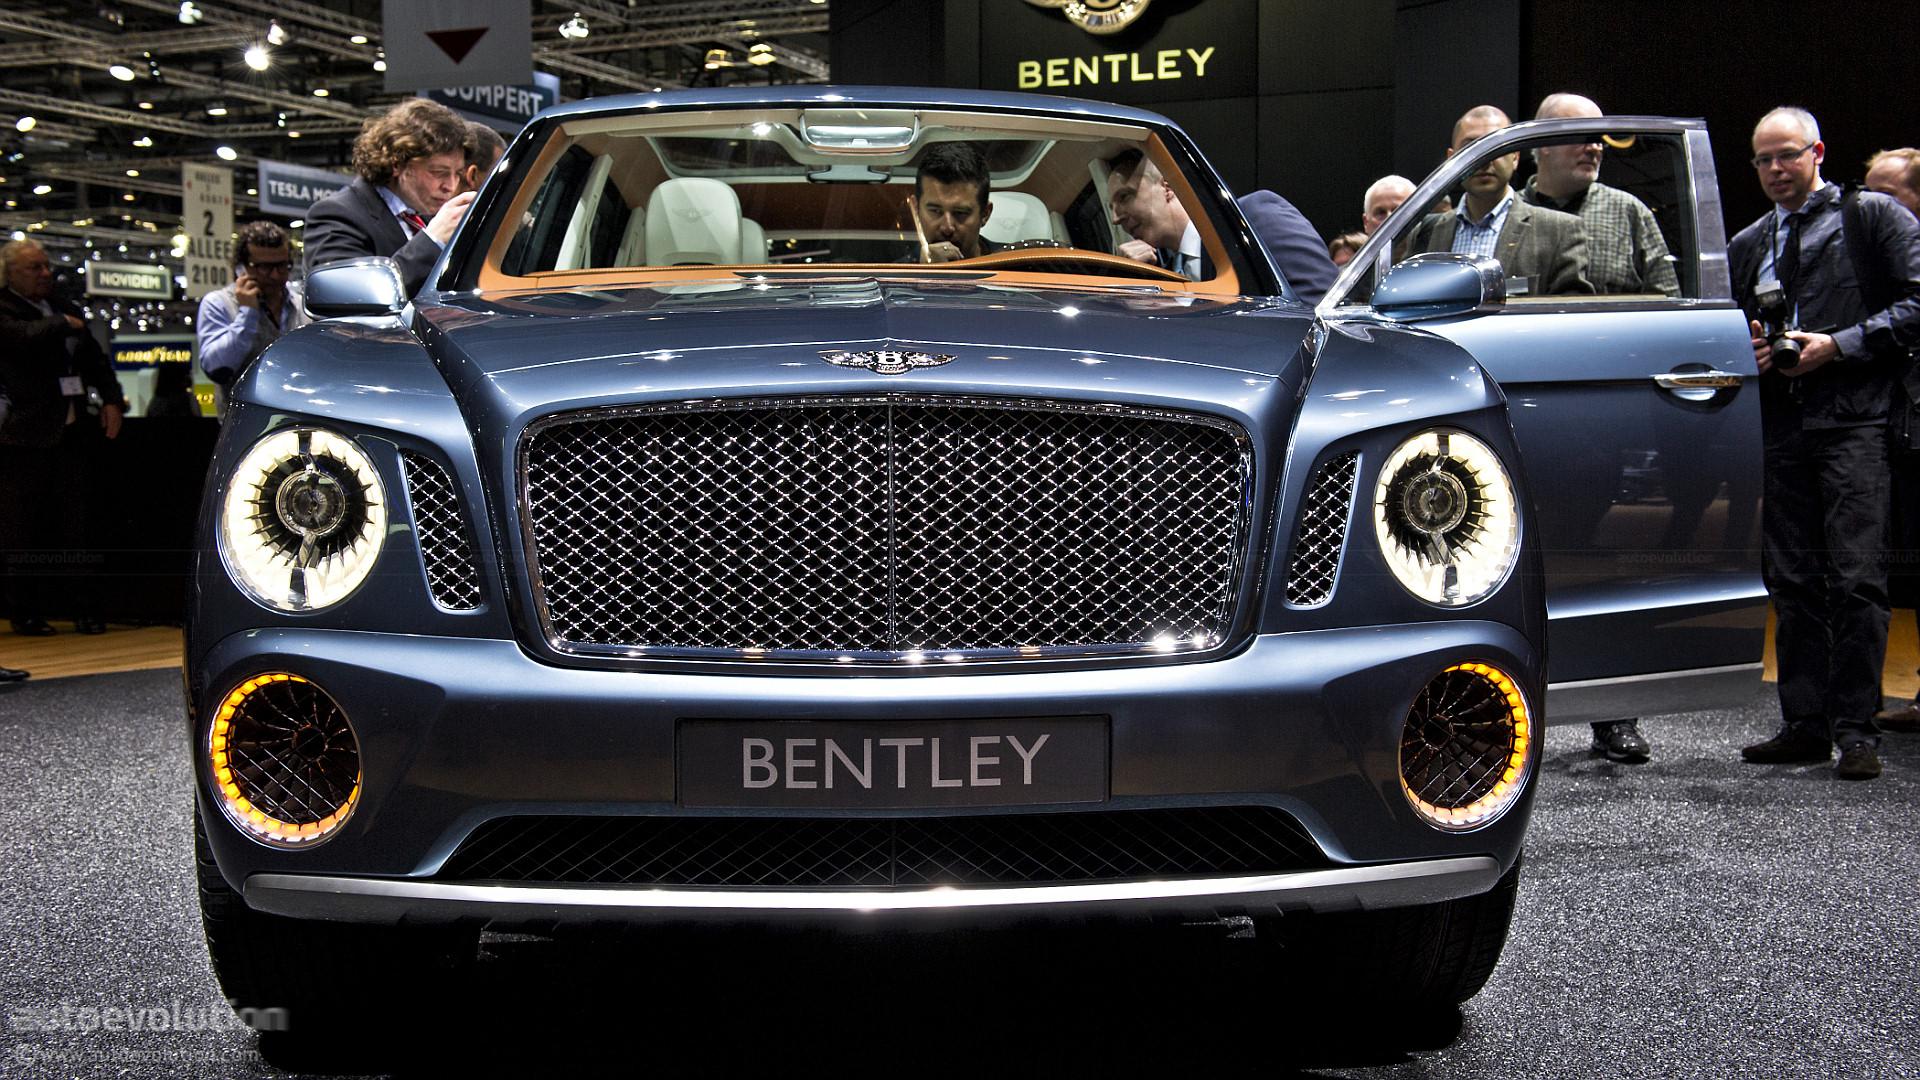 Black Qx70 >> Bentley SUV Gets Production Green Light - autoevolution